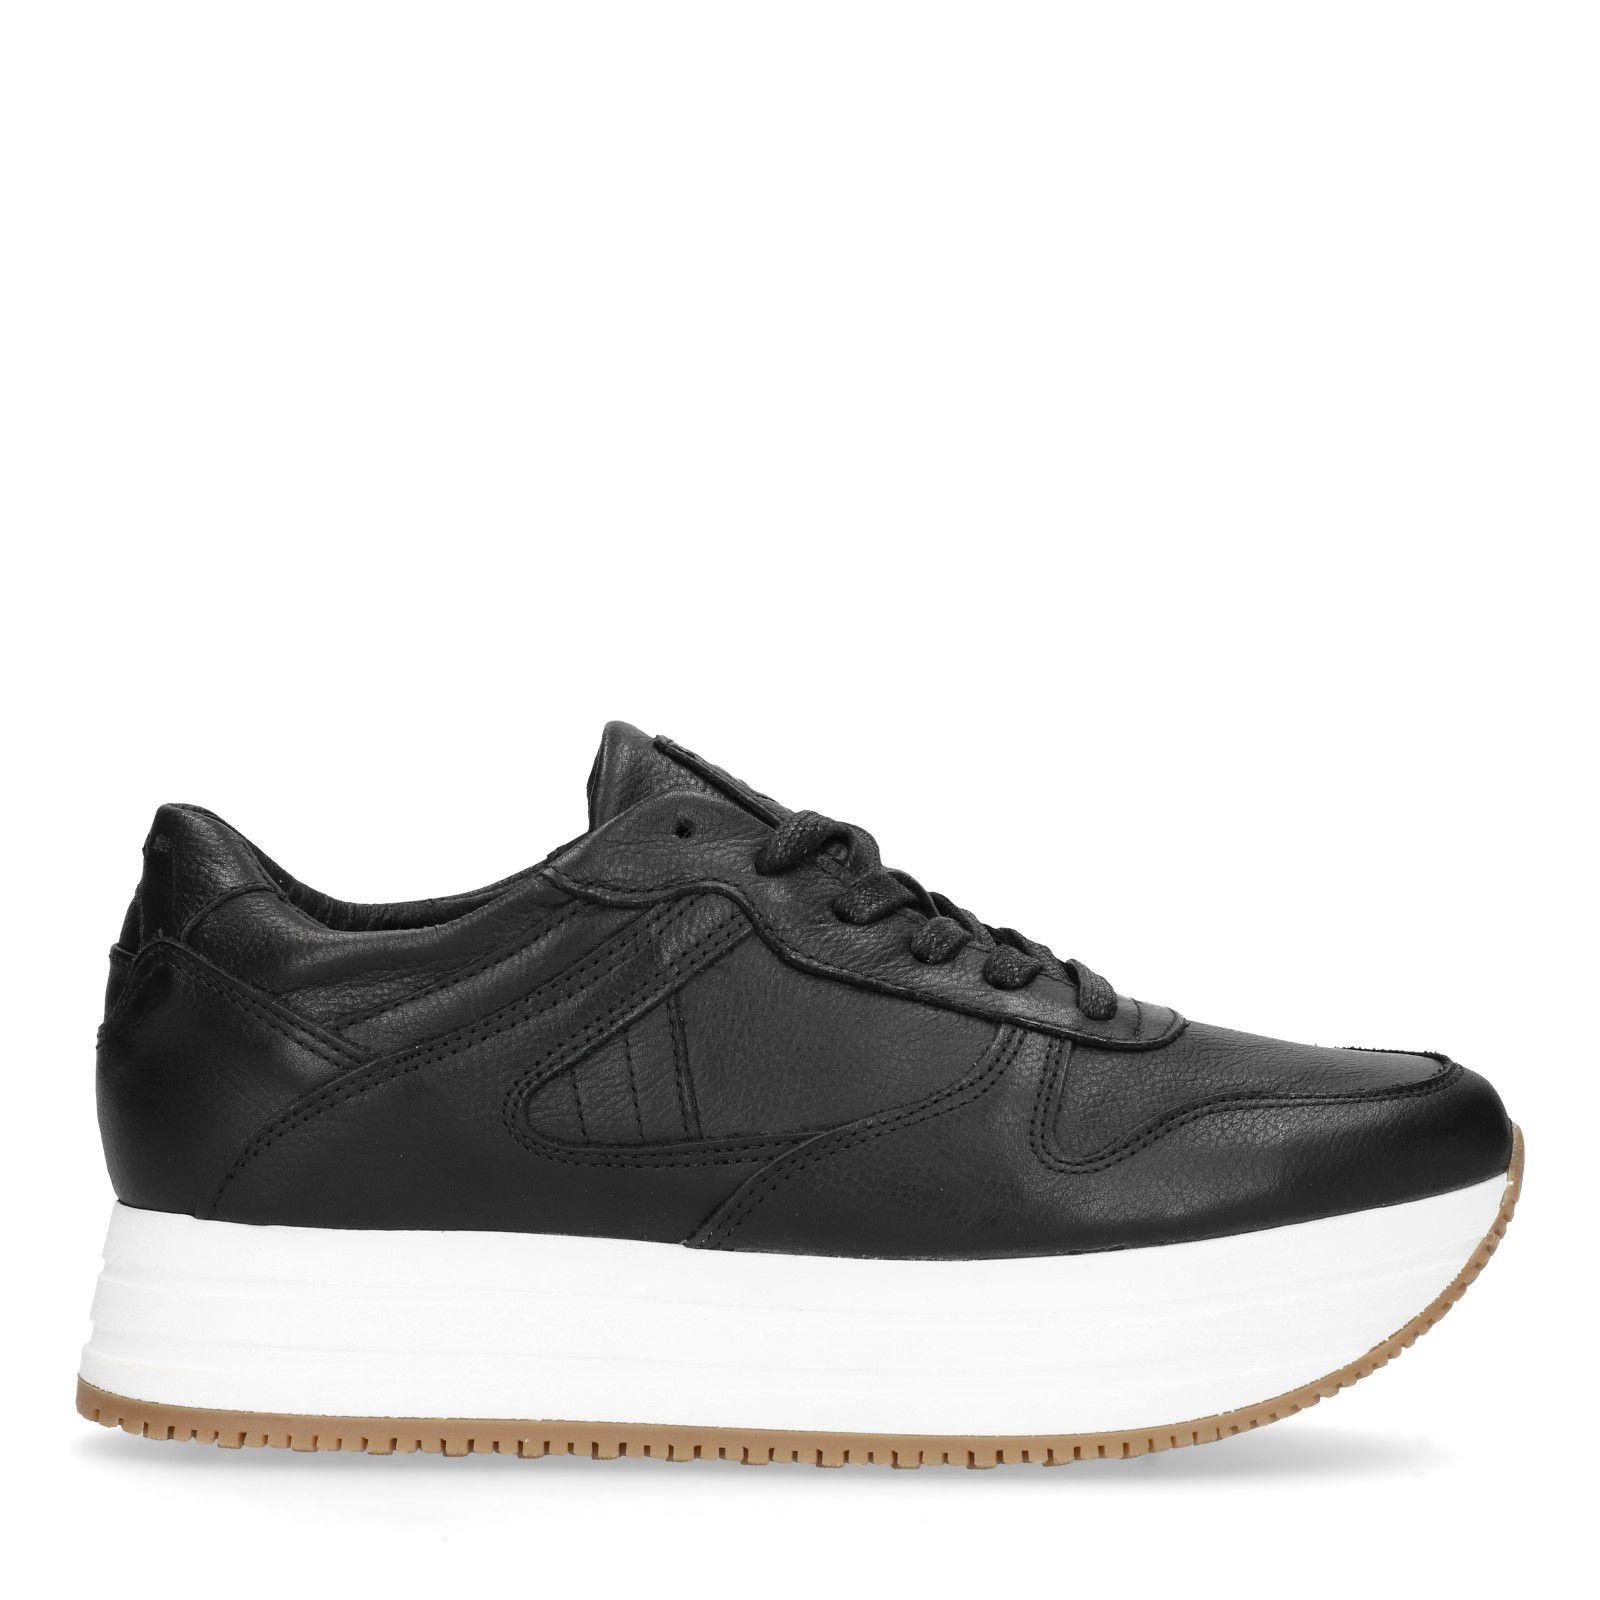 d8f66a256db Sacha Sneakers Zwarte Platform Damesschoenen Leren – SqPO6XB